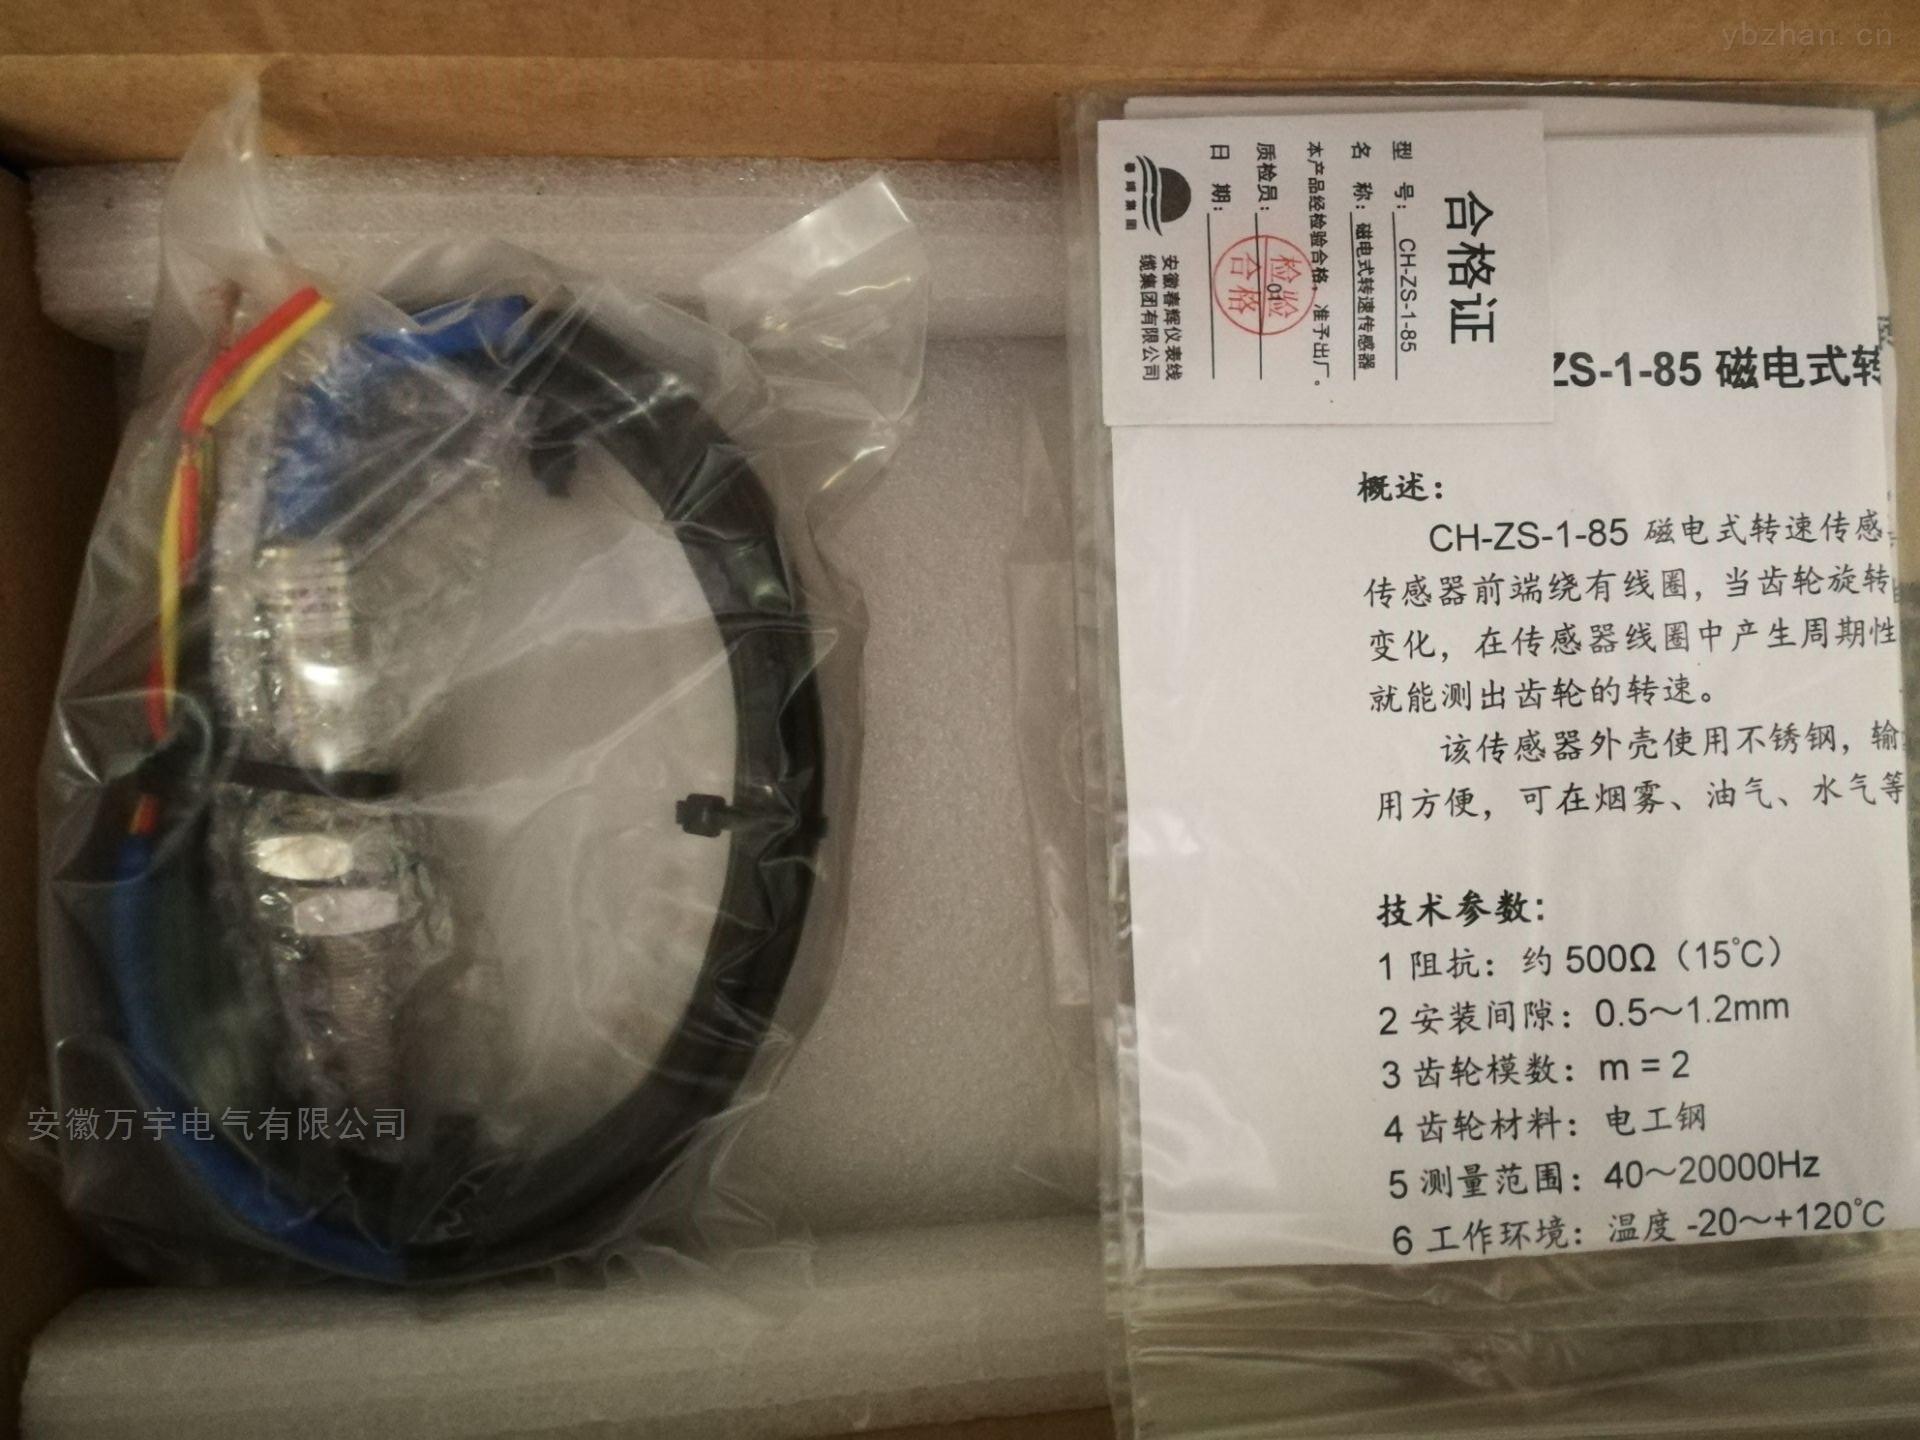 T-05/HL-05/HL-03-磁电式振动传感器